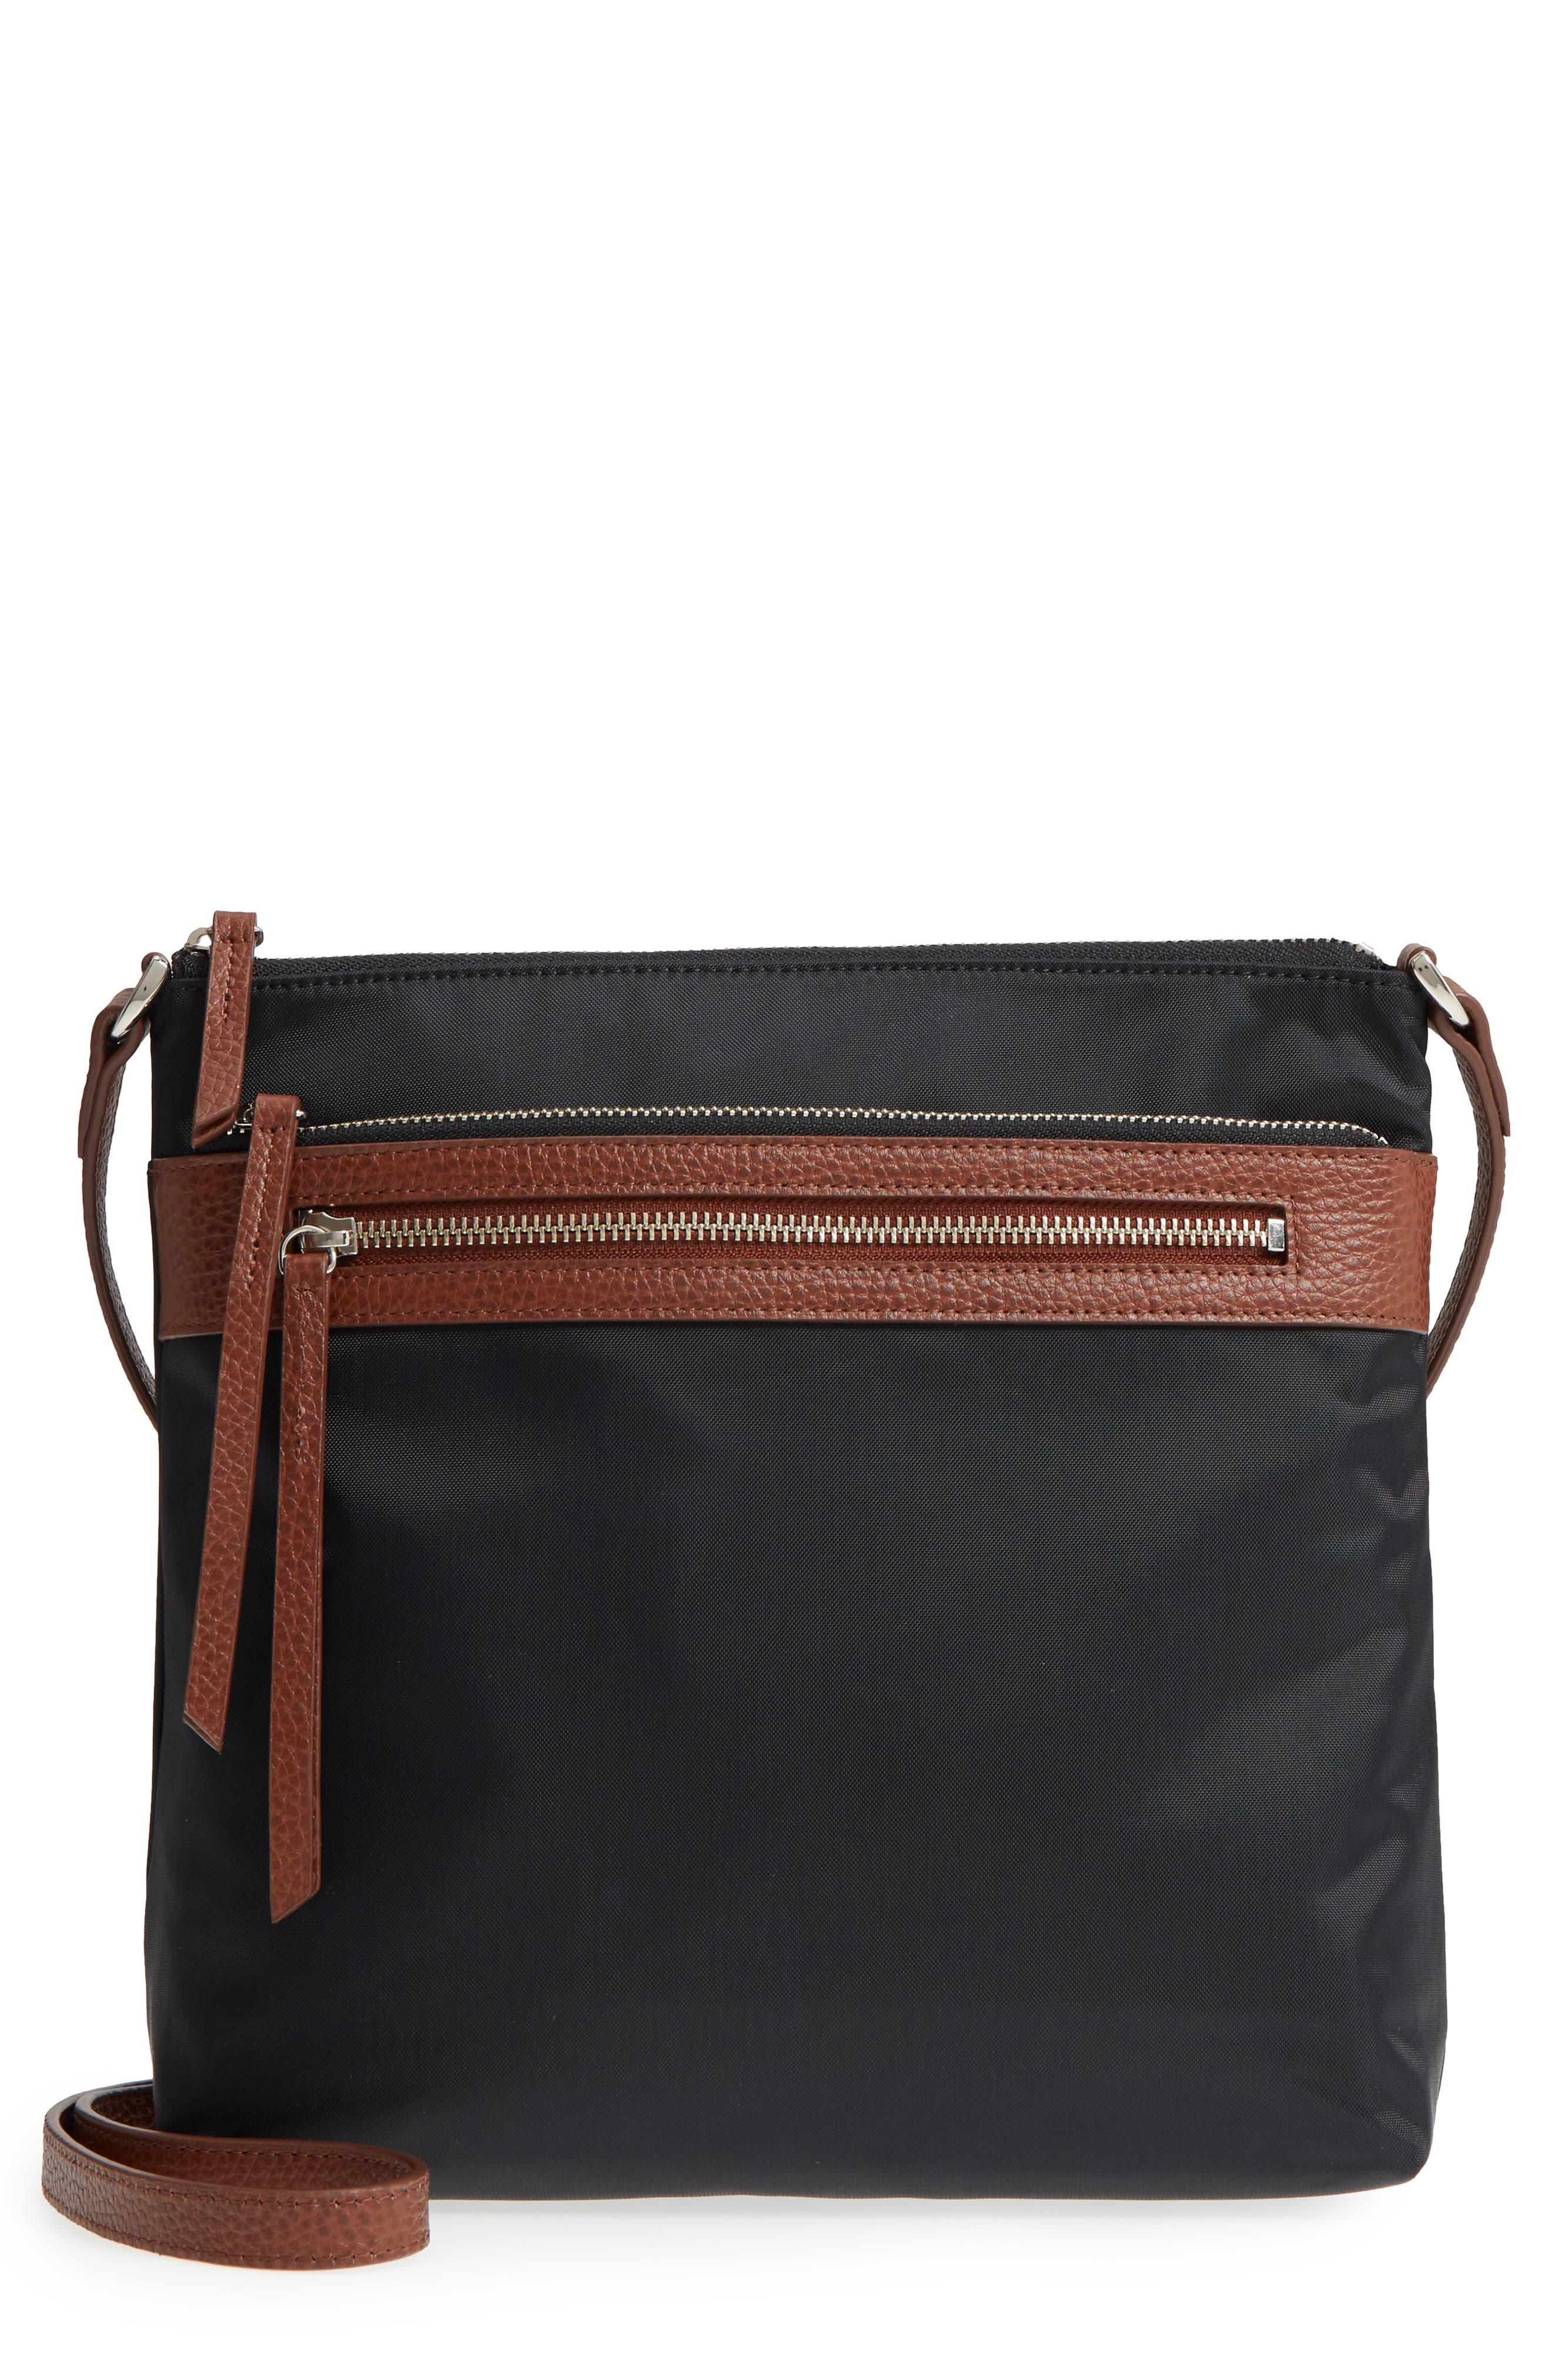 Kaison Nylon Crossbody Bag,                             Main thumbnail 1, color,                             002